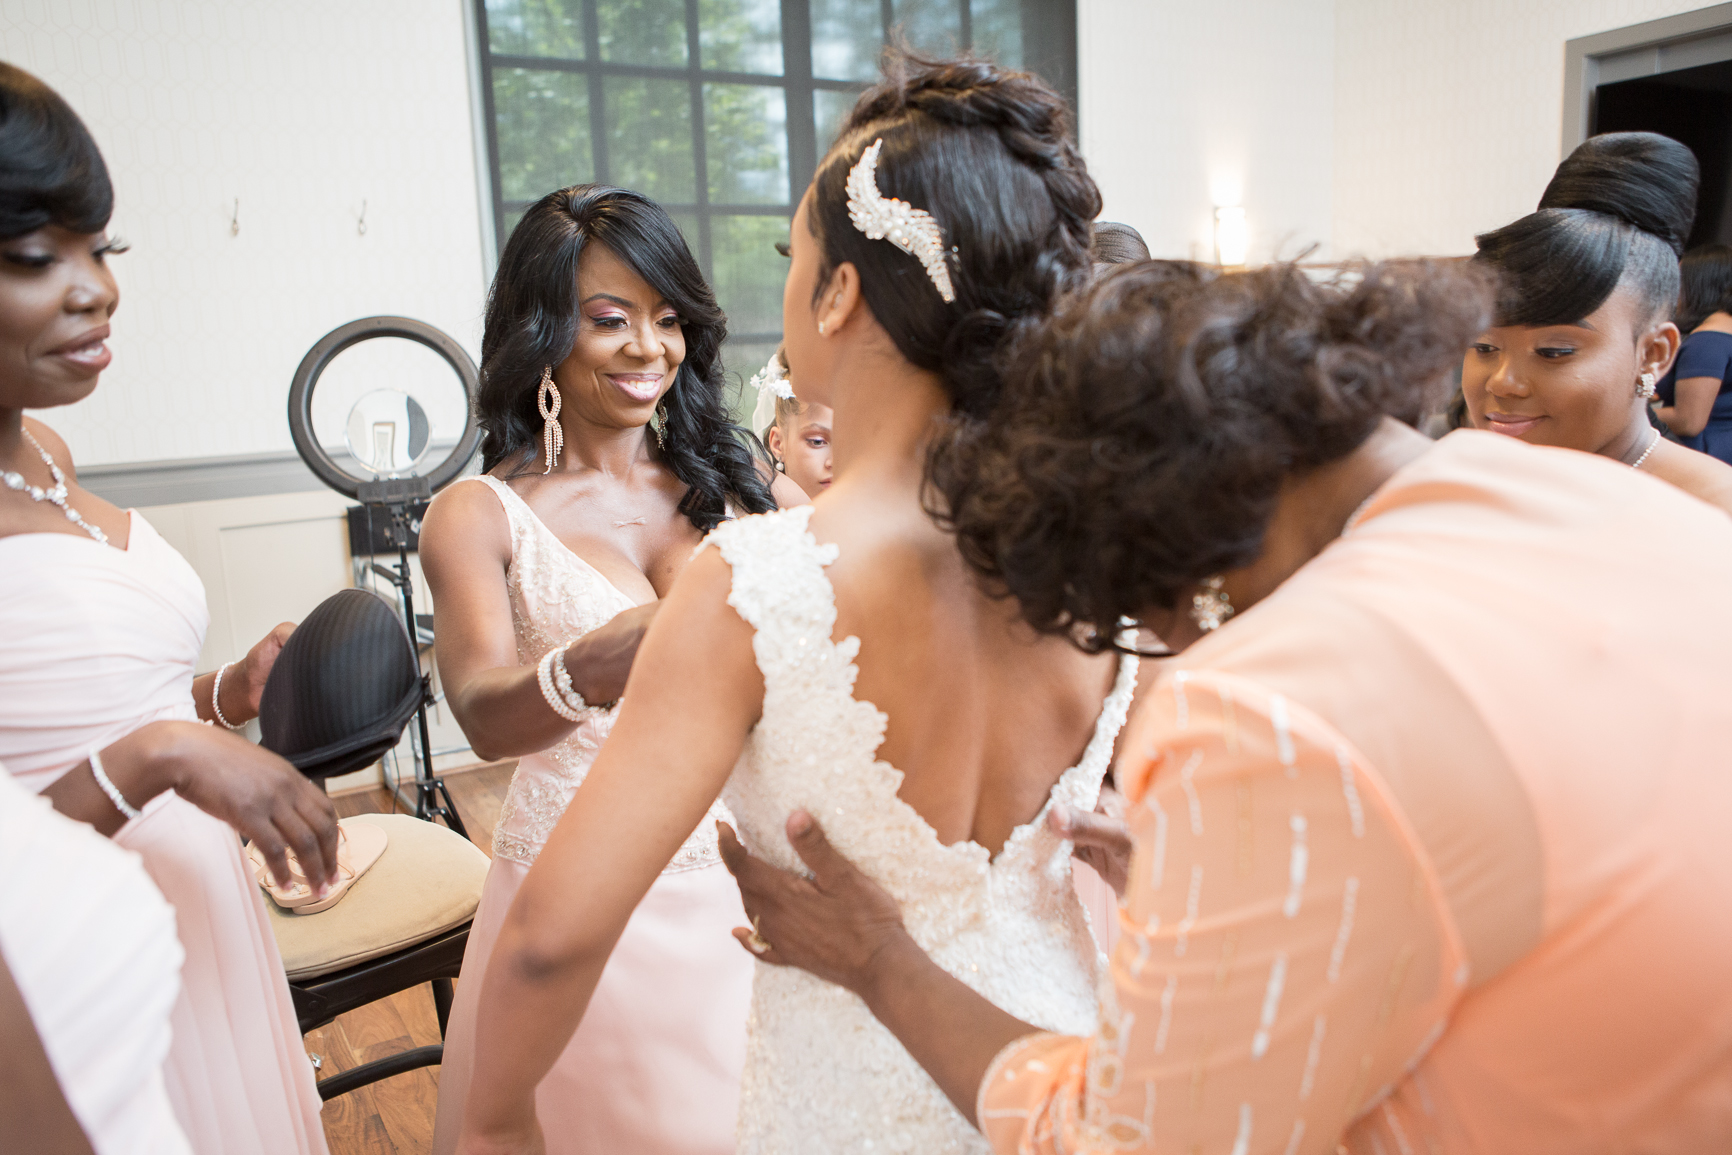 Noah;s Morrisville wedding photographer - 101 studio llc -11.jpg